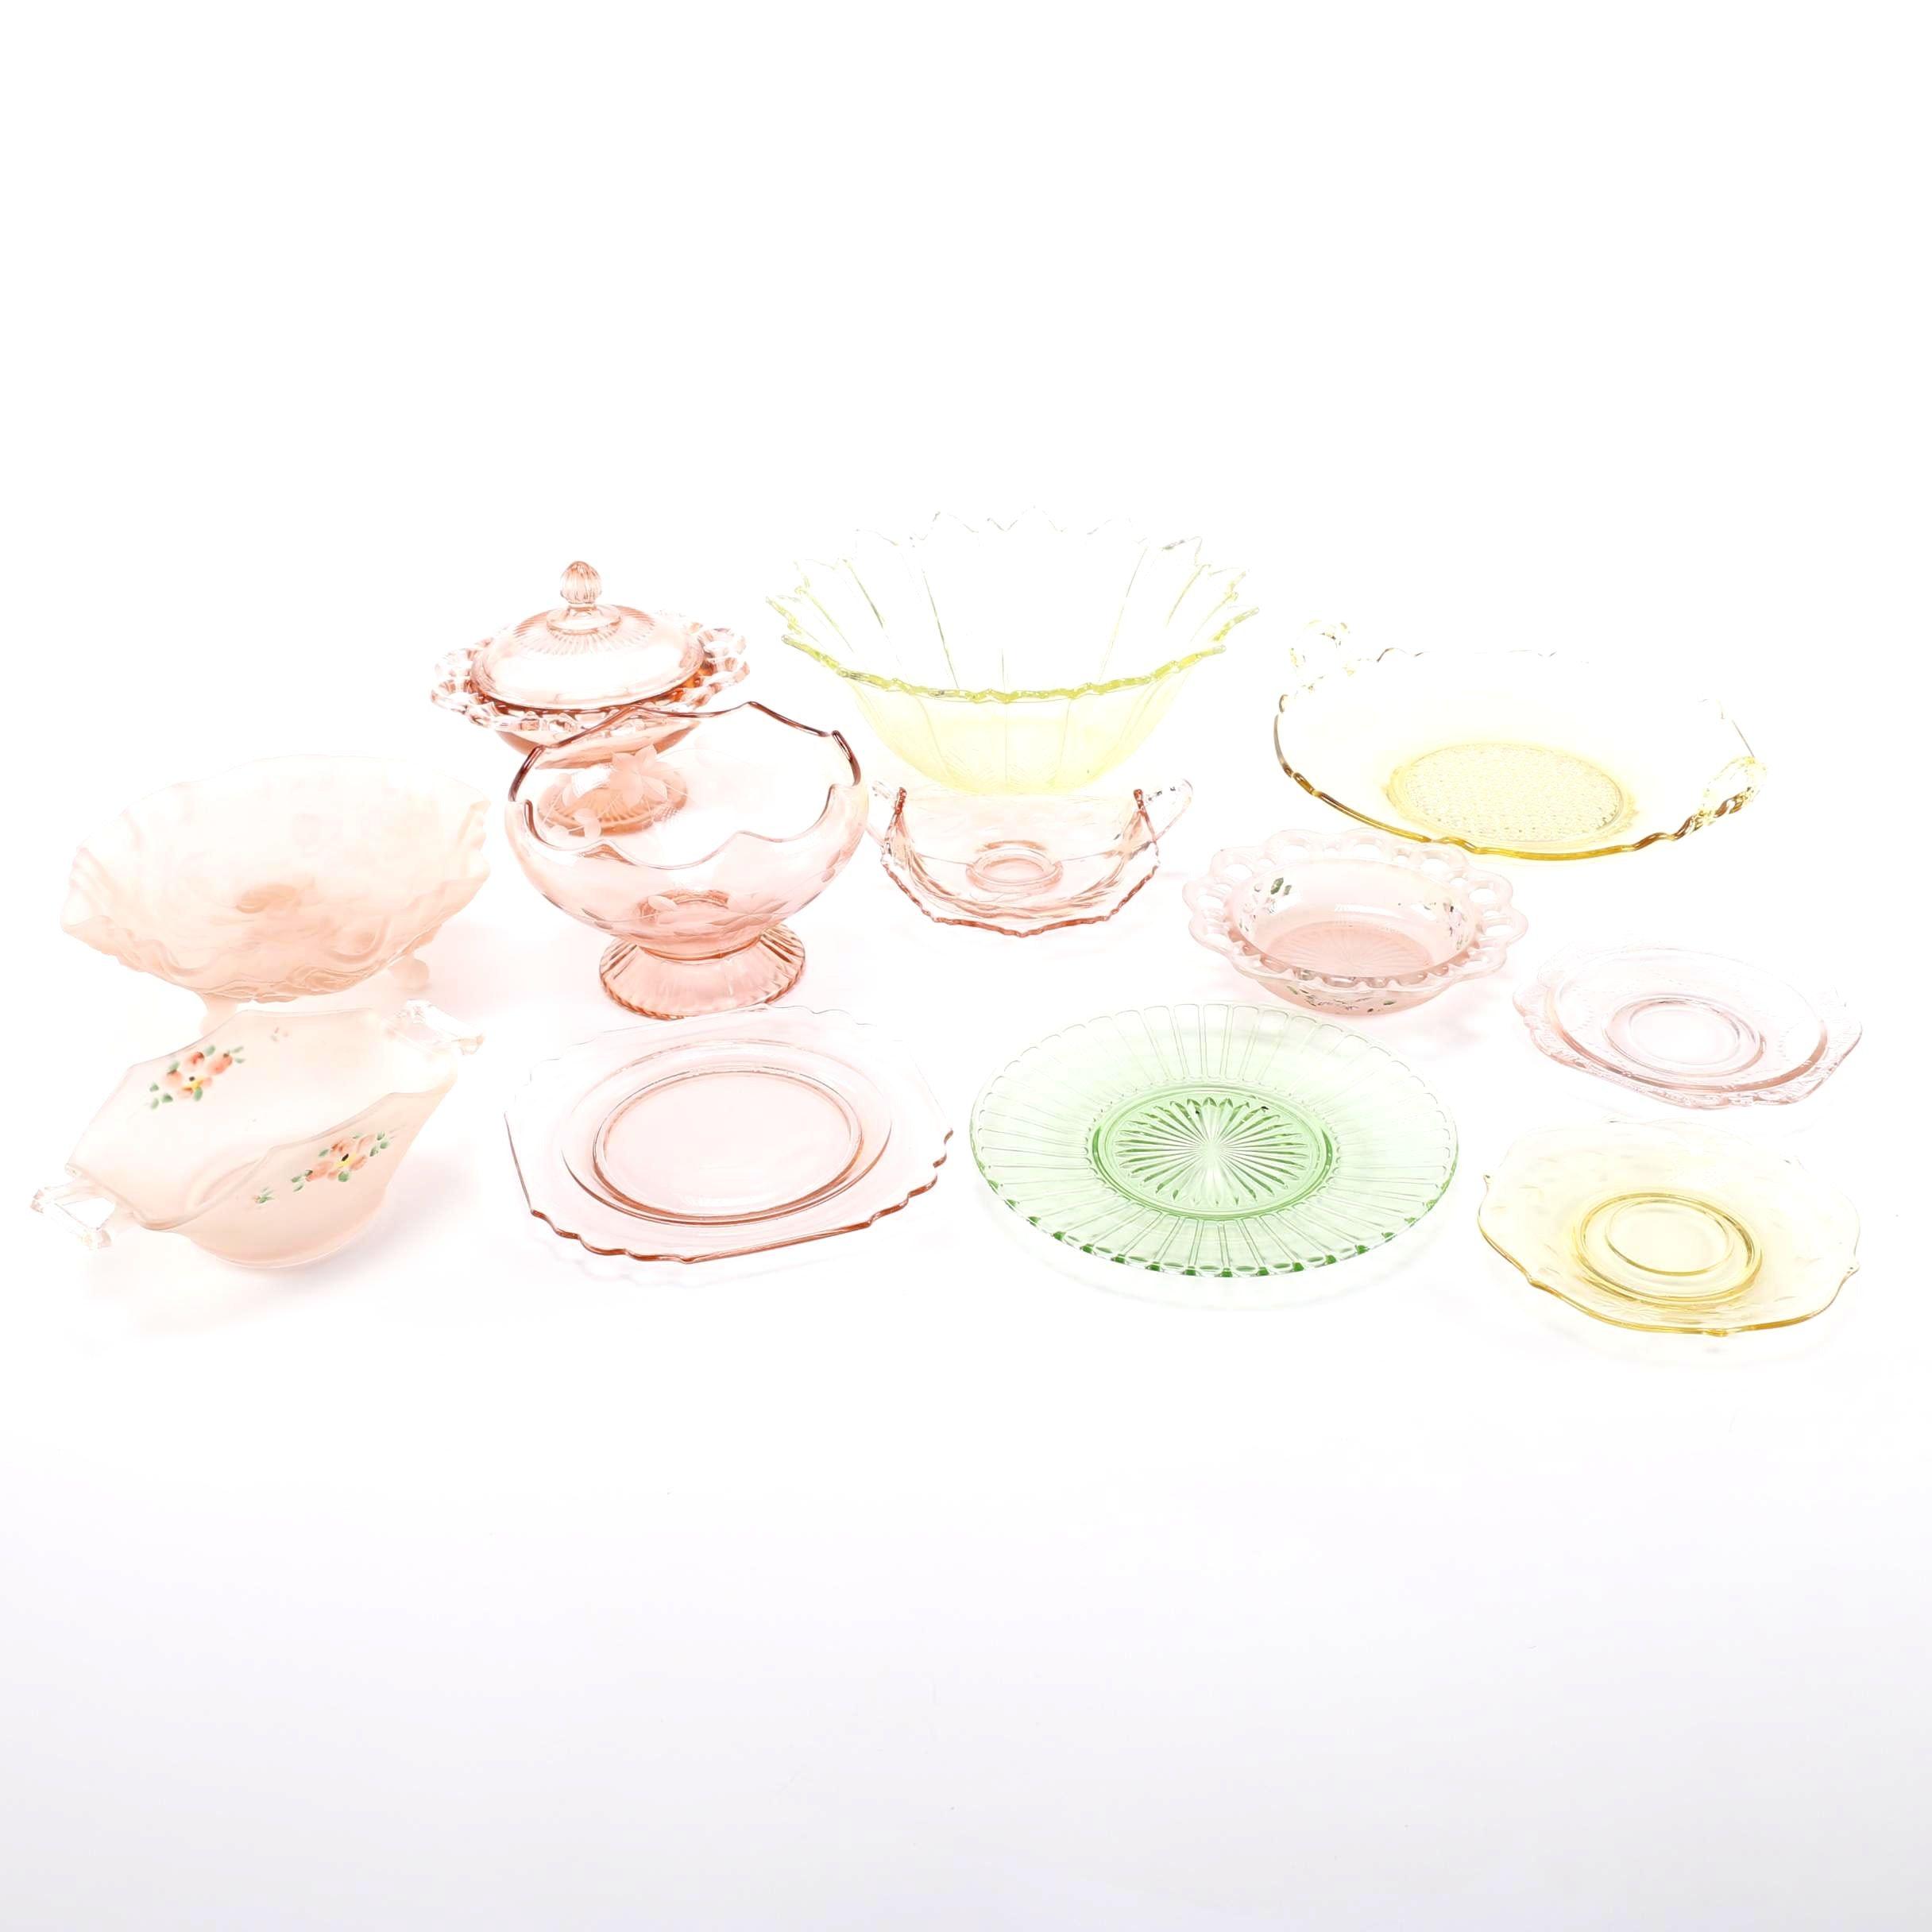 Assortment of Depression Glass Tableware